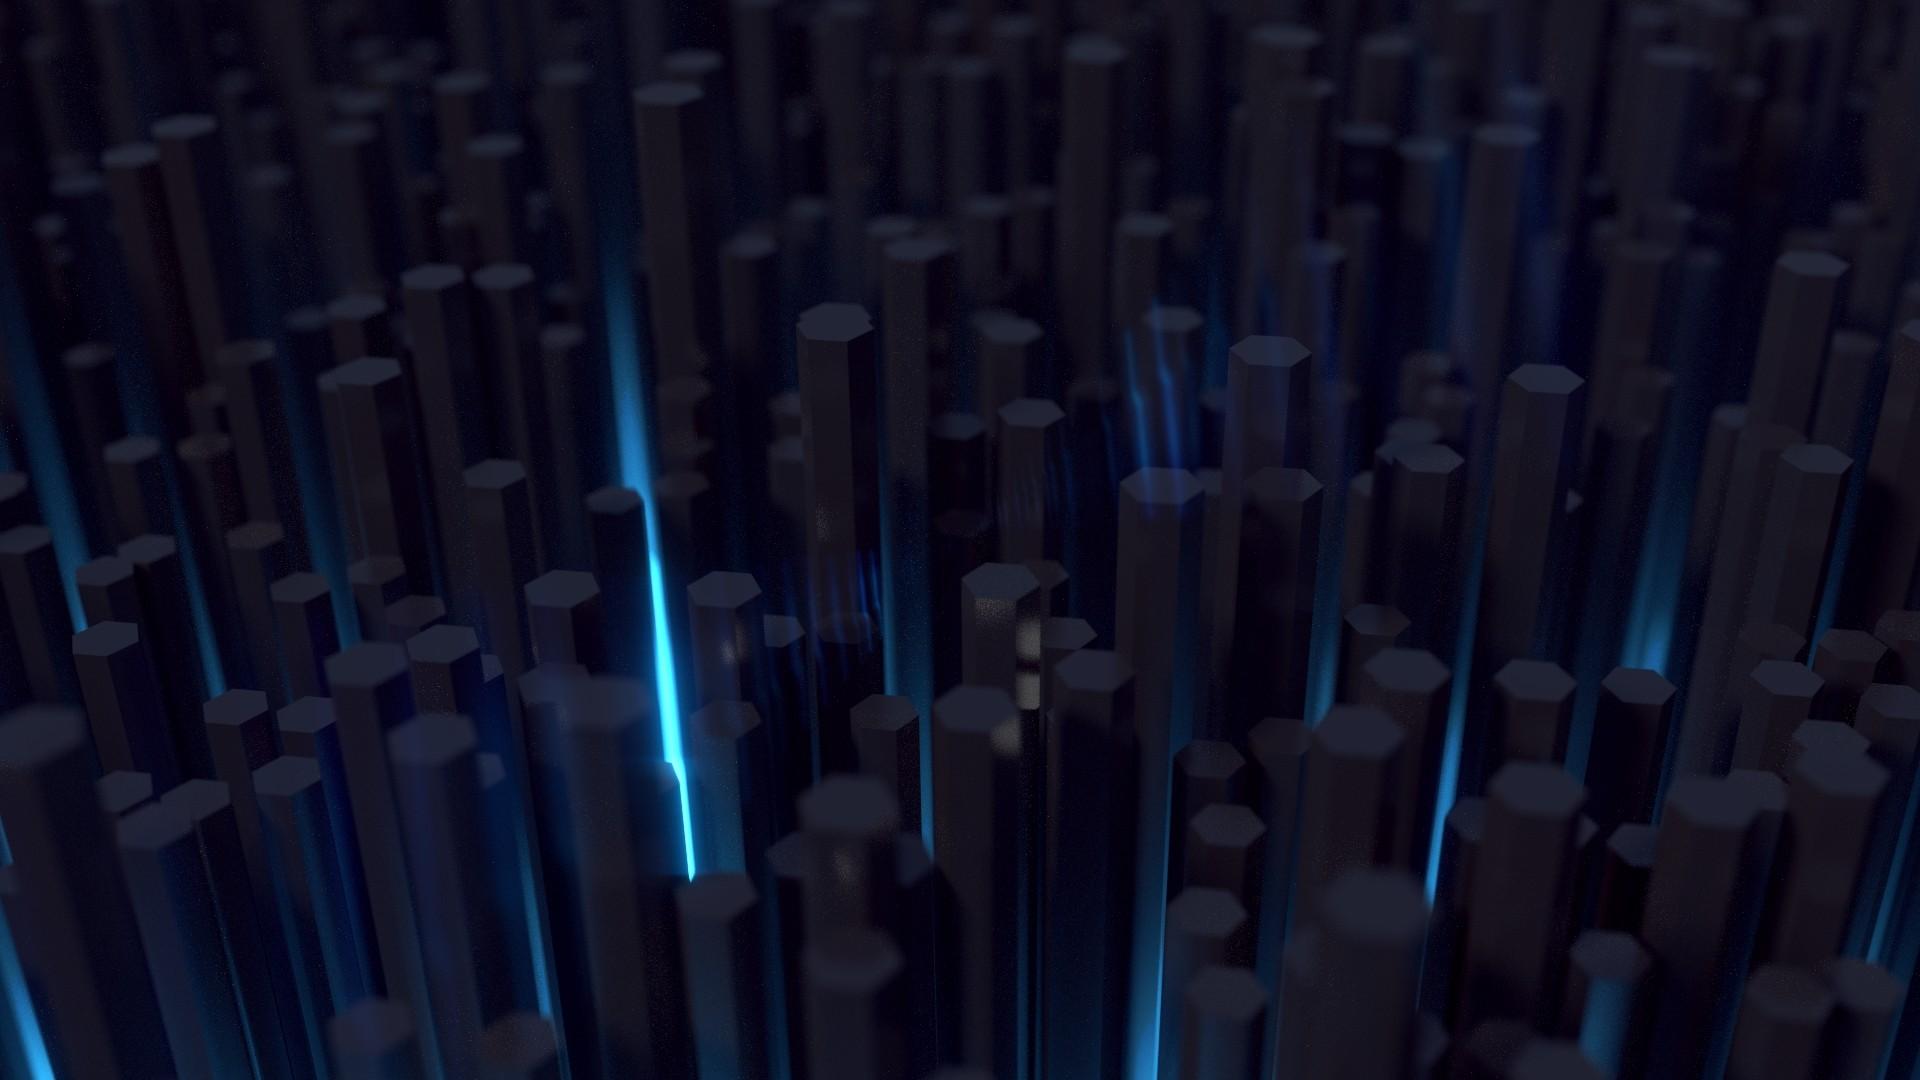 Wallpaper Lampu Seni Digital Abstrak 3D Biru Segi